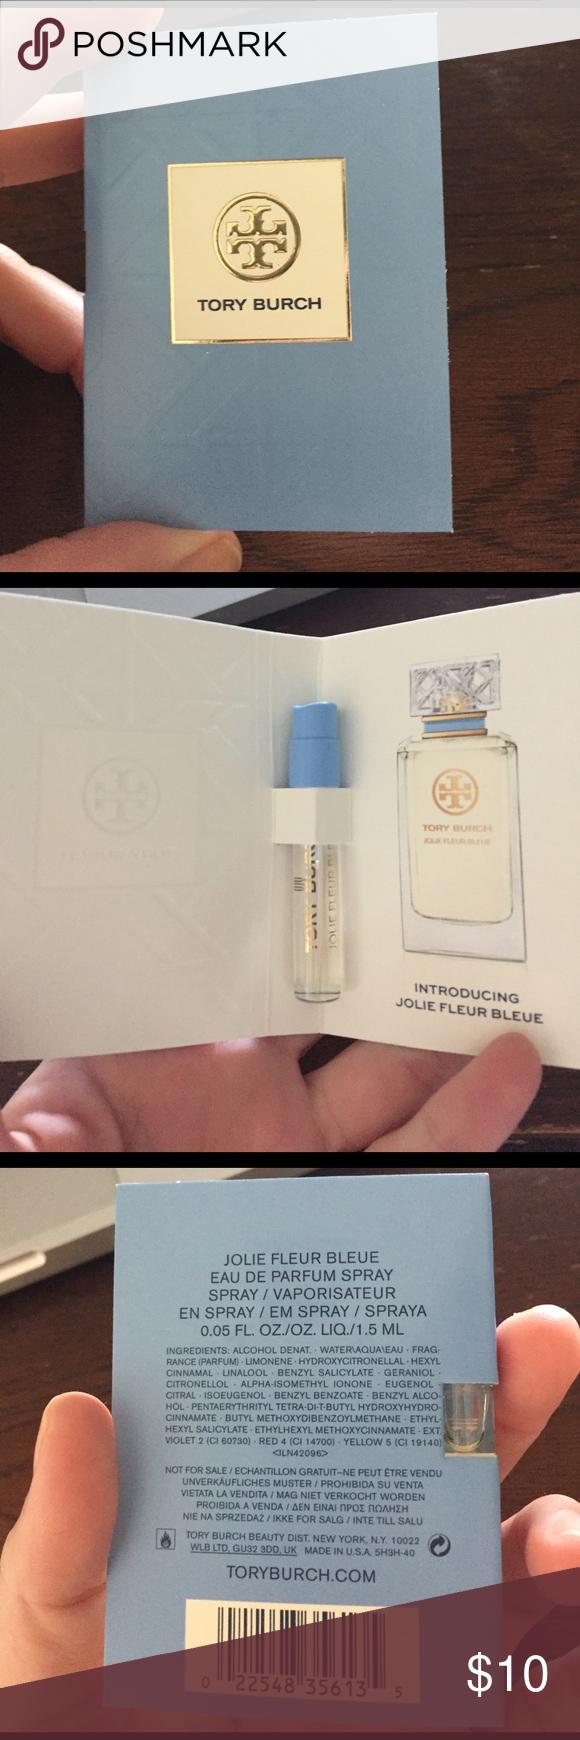 "Tory Burch ""Jolie Fleur Bleue"" Perfume Tory Burch Jolie fleur bleue perfume sample. 0.05 oz, never used. Tory Burch Makeup"